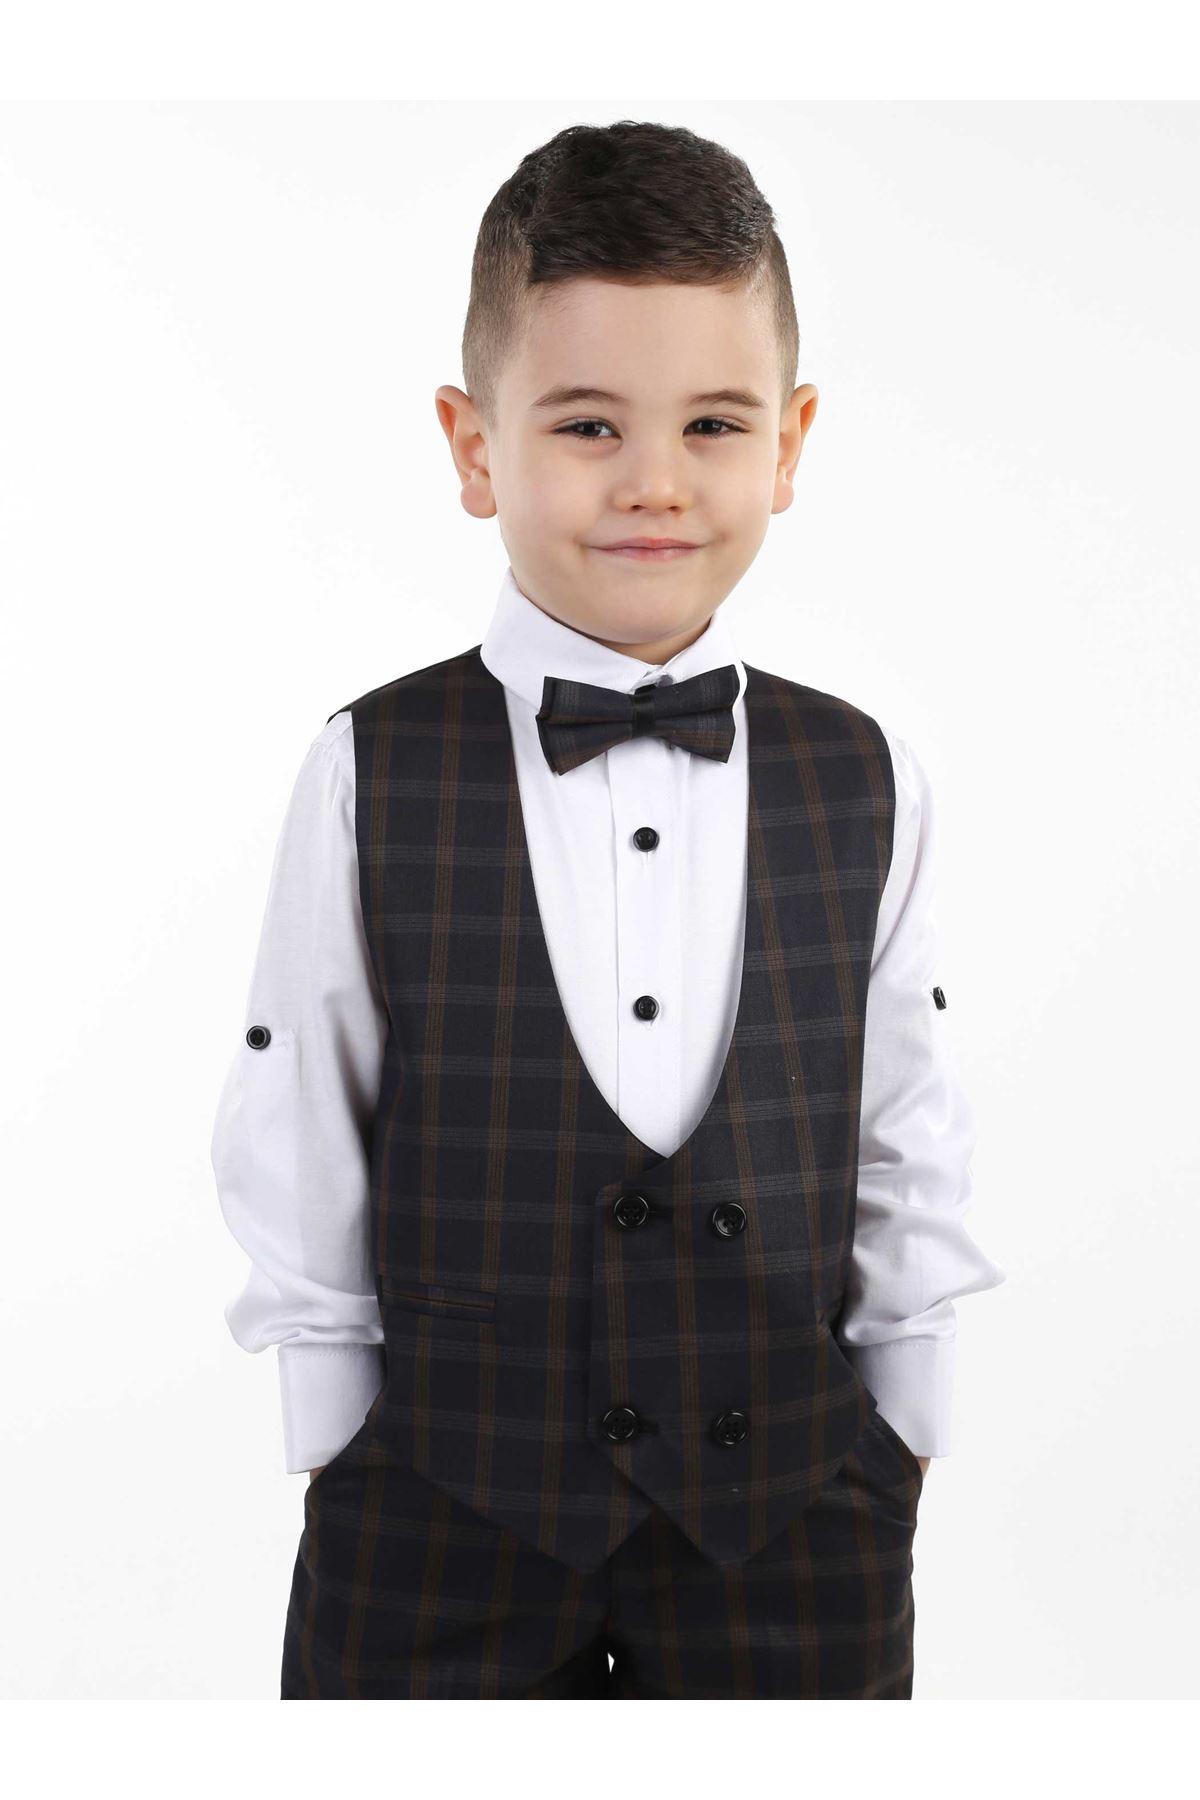 Boy's Clothes Suits Gentleman Bow Tie + Shirt + Pants + Vest Gentleman Clothing Young Suit